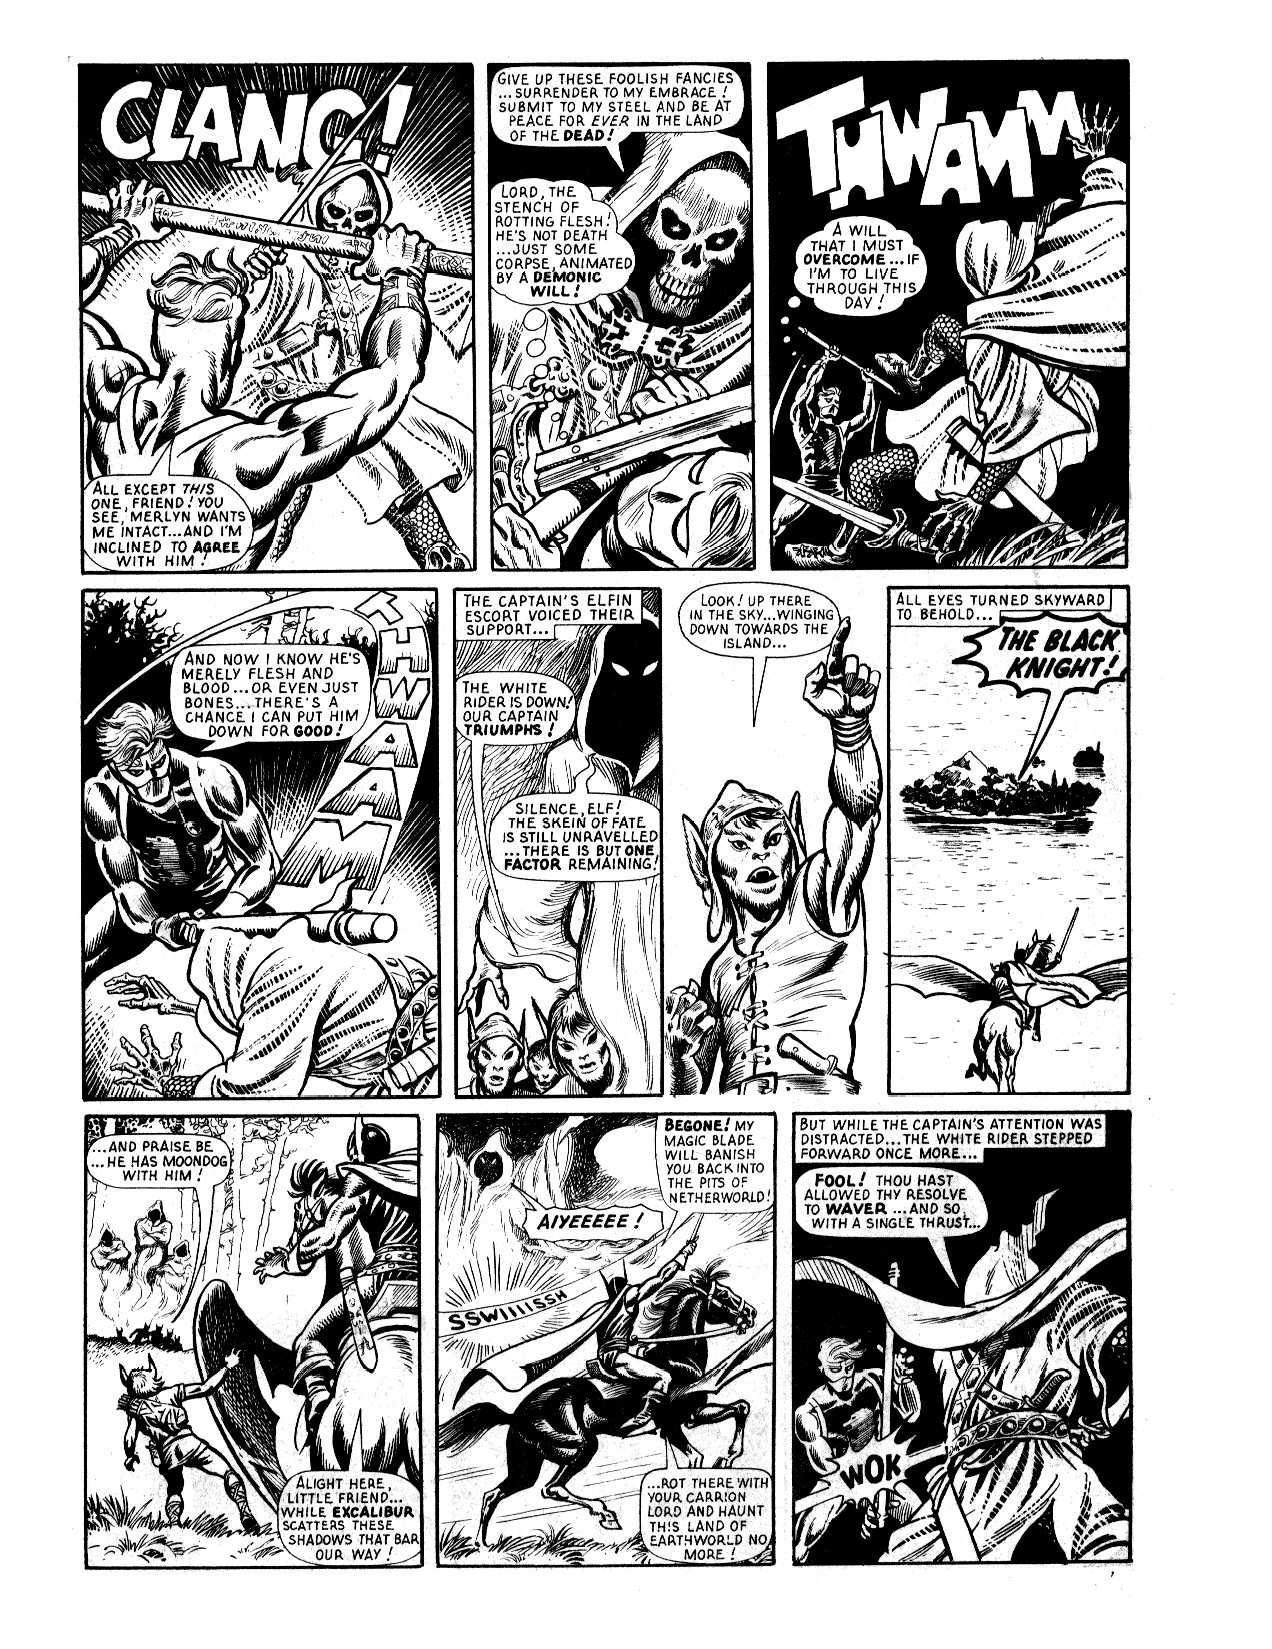 Captain Britain Siege of Camelot review